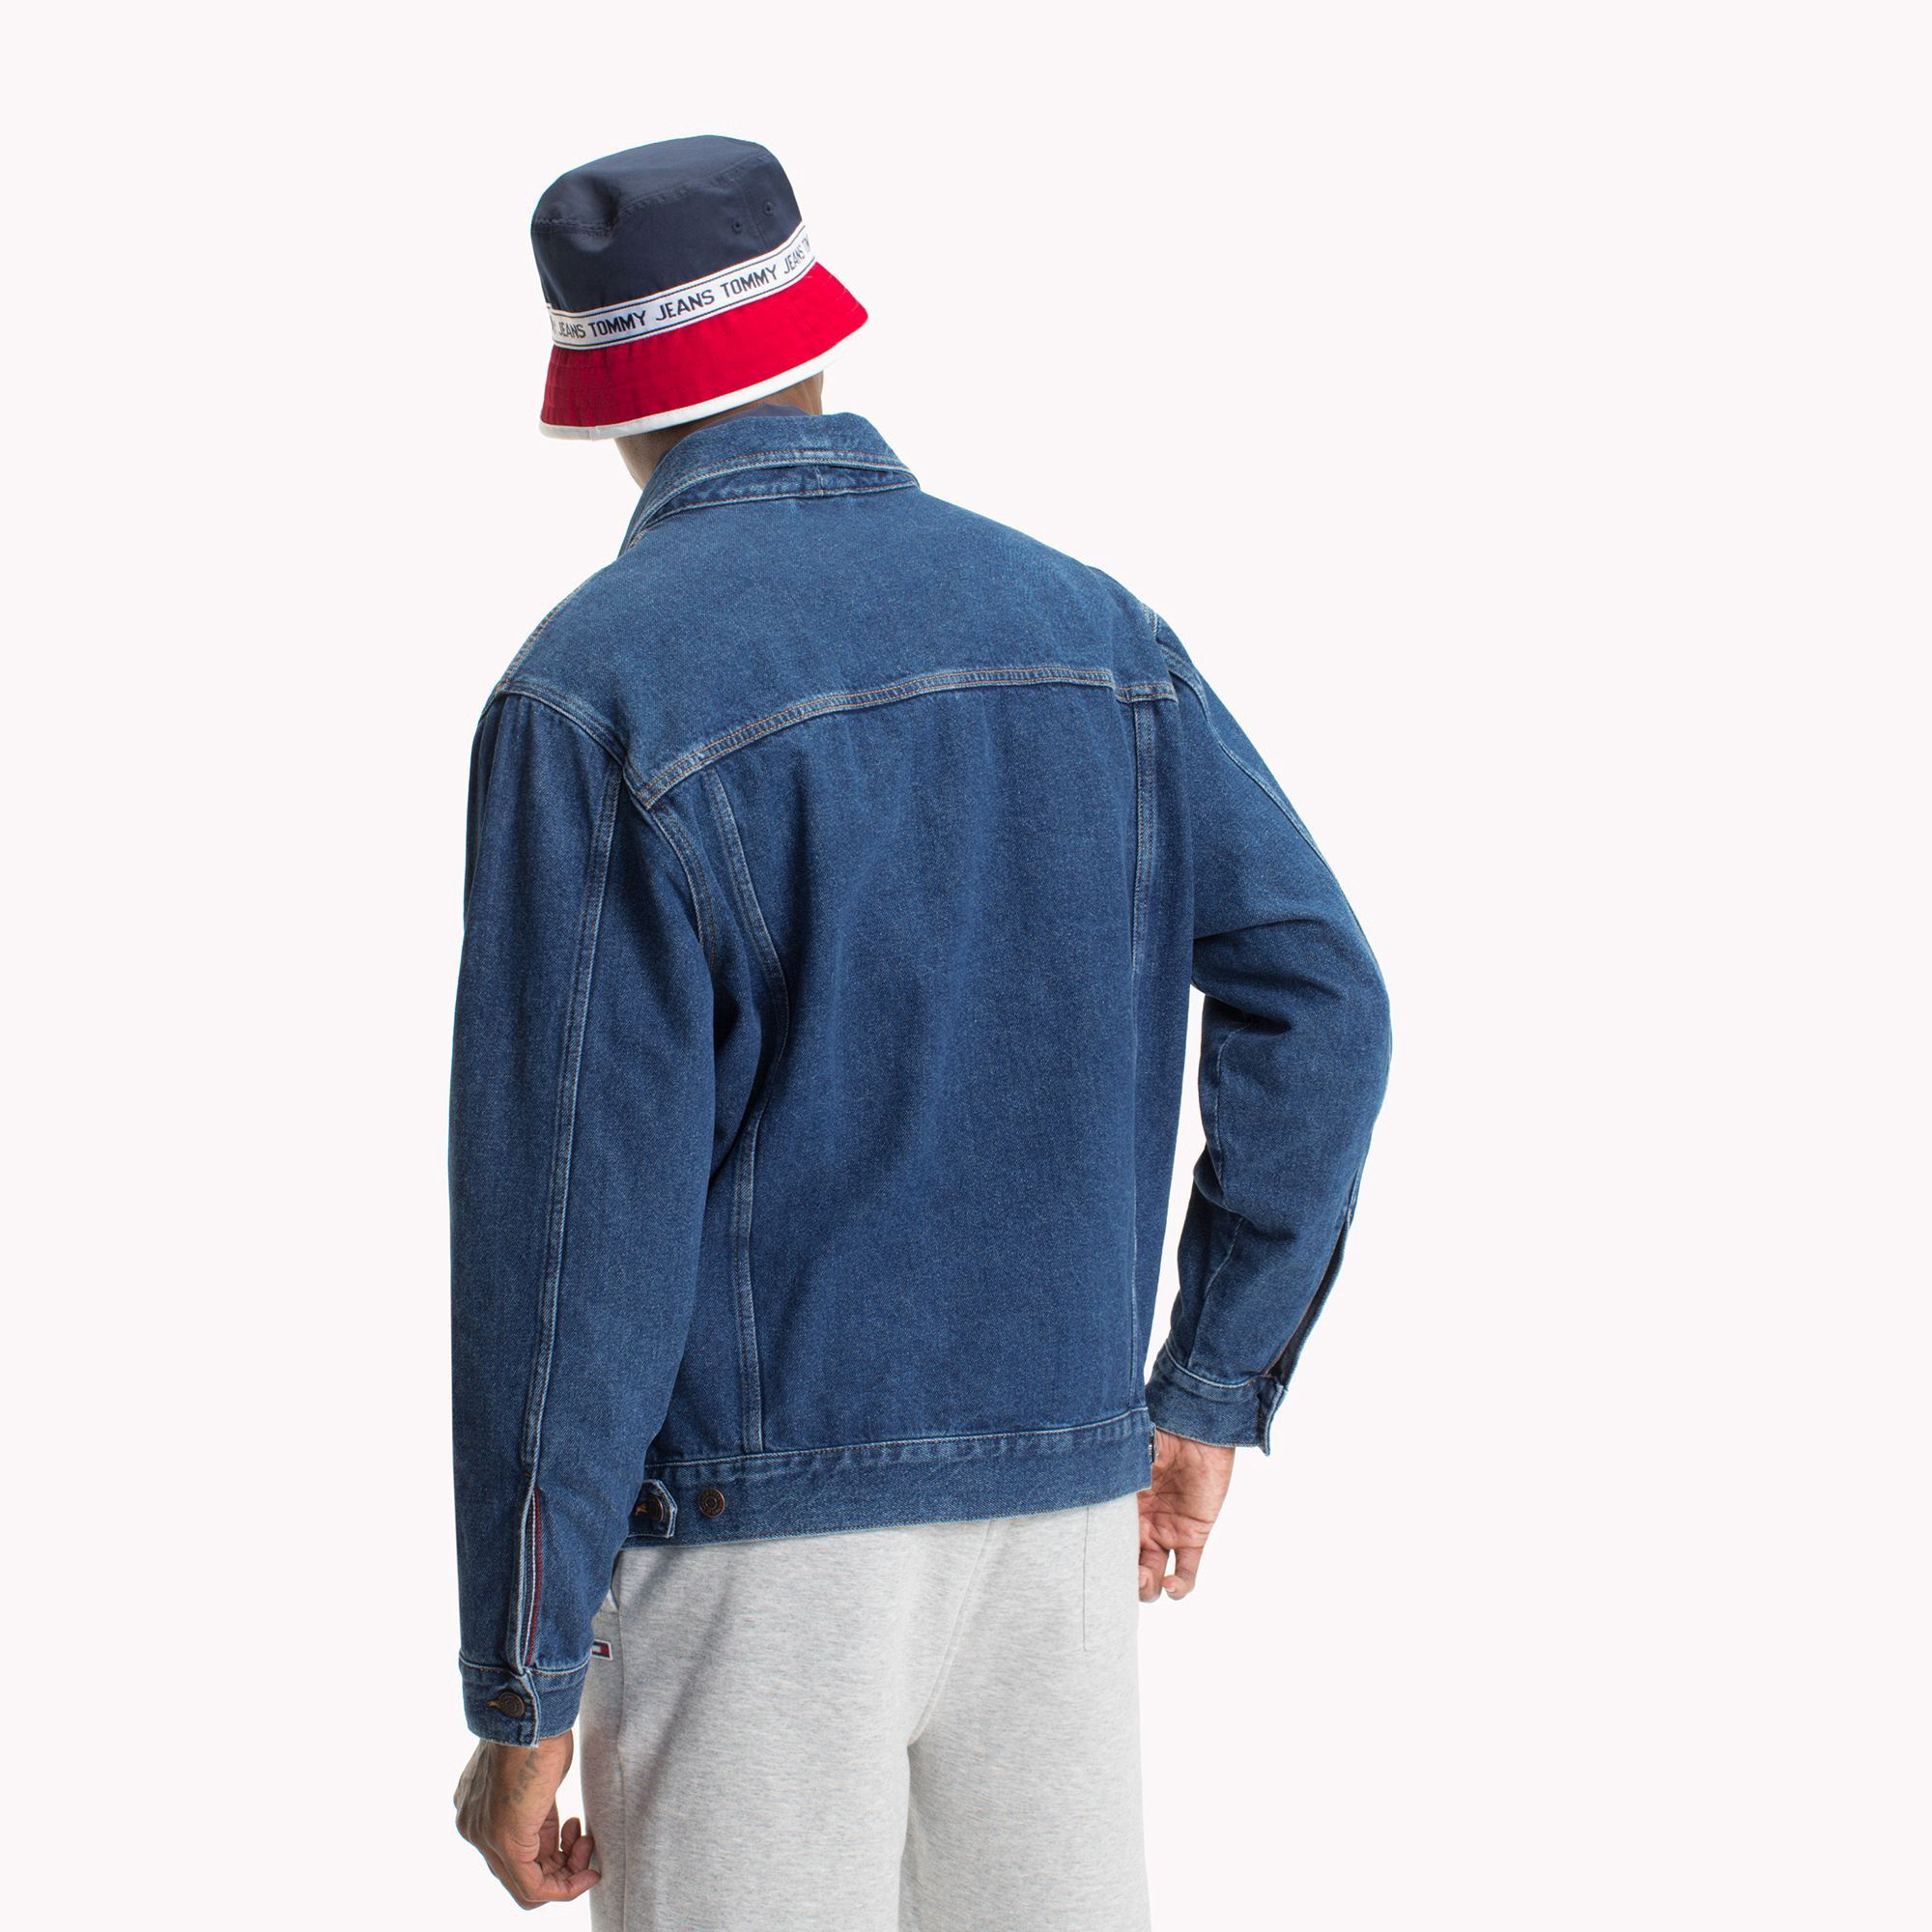 5c81af310 Tommy Hilfiger Jeans Xplore Jean Jacket - S   Products   Tommy ...